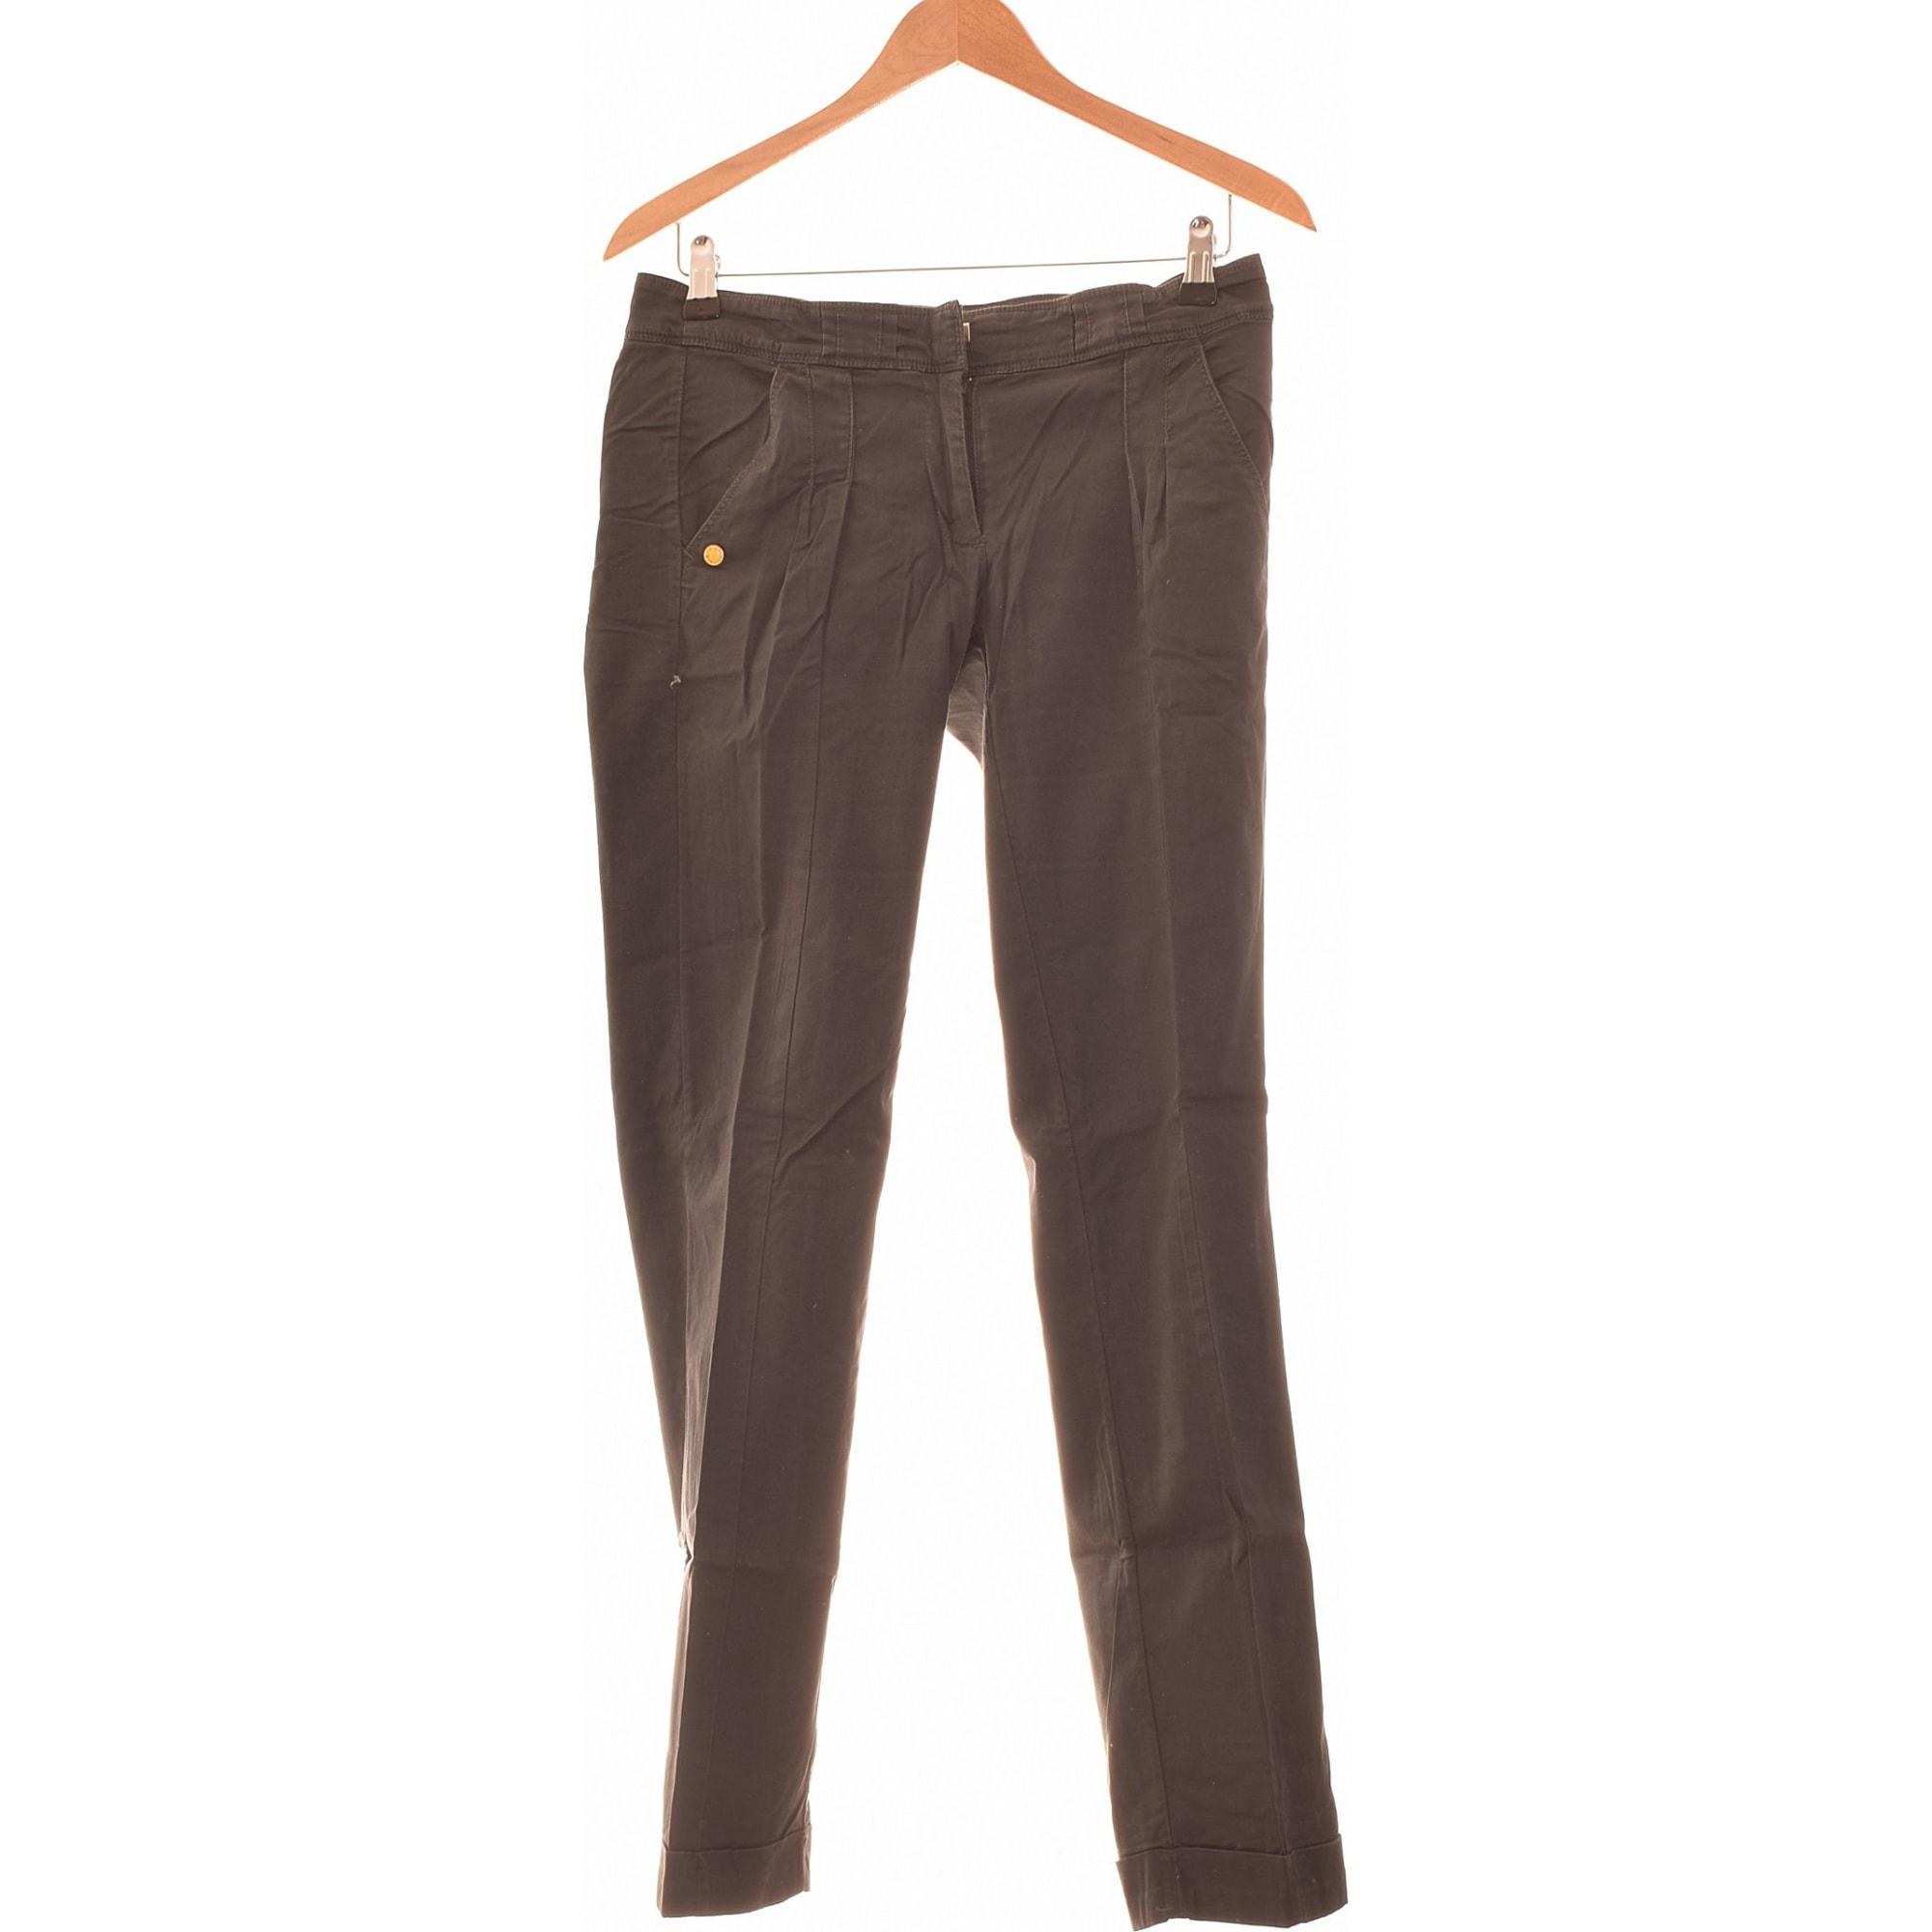 Pantalon droit ADIDAS Gris, anthracite